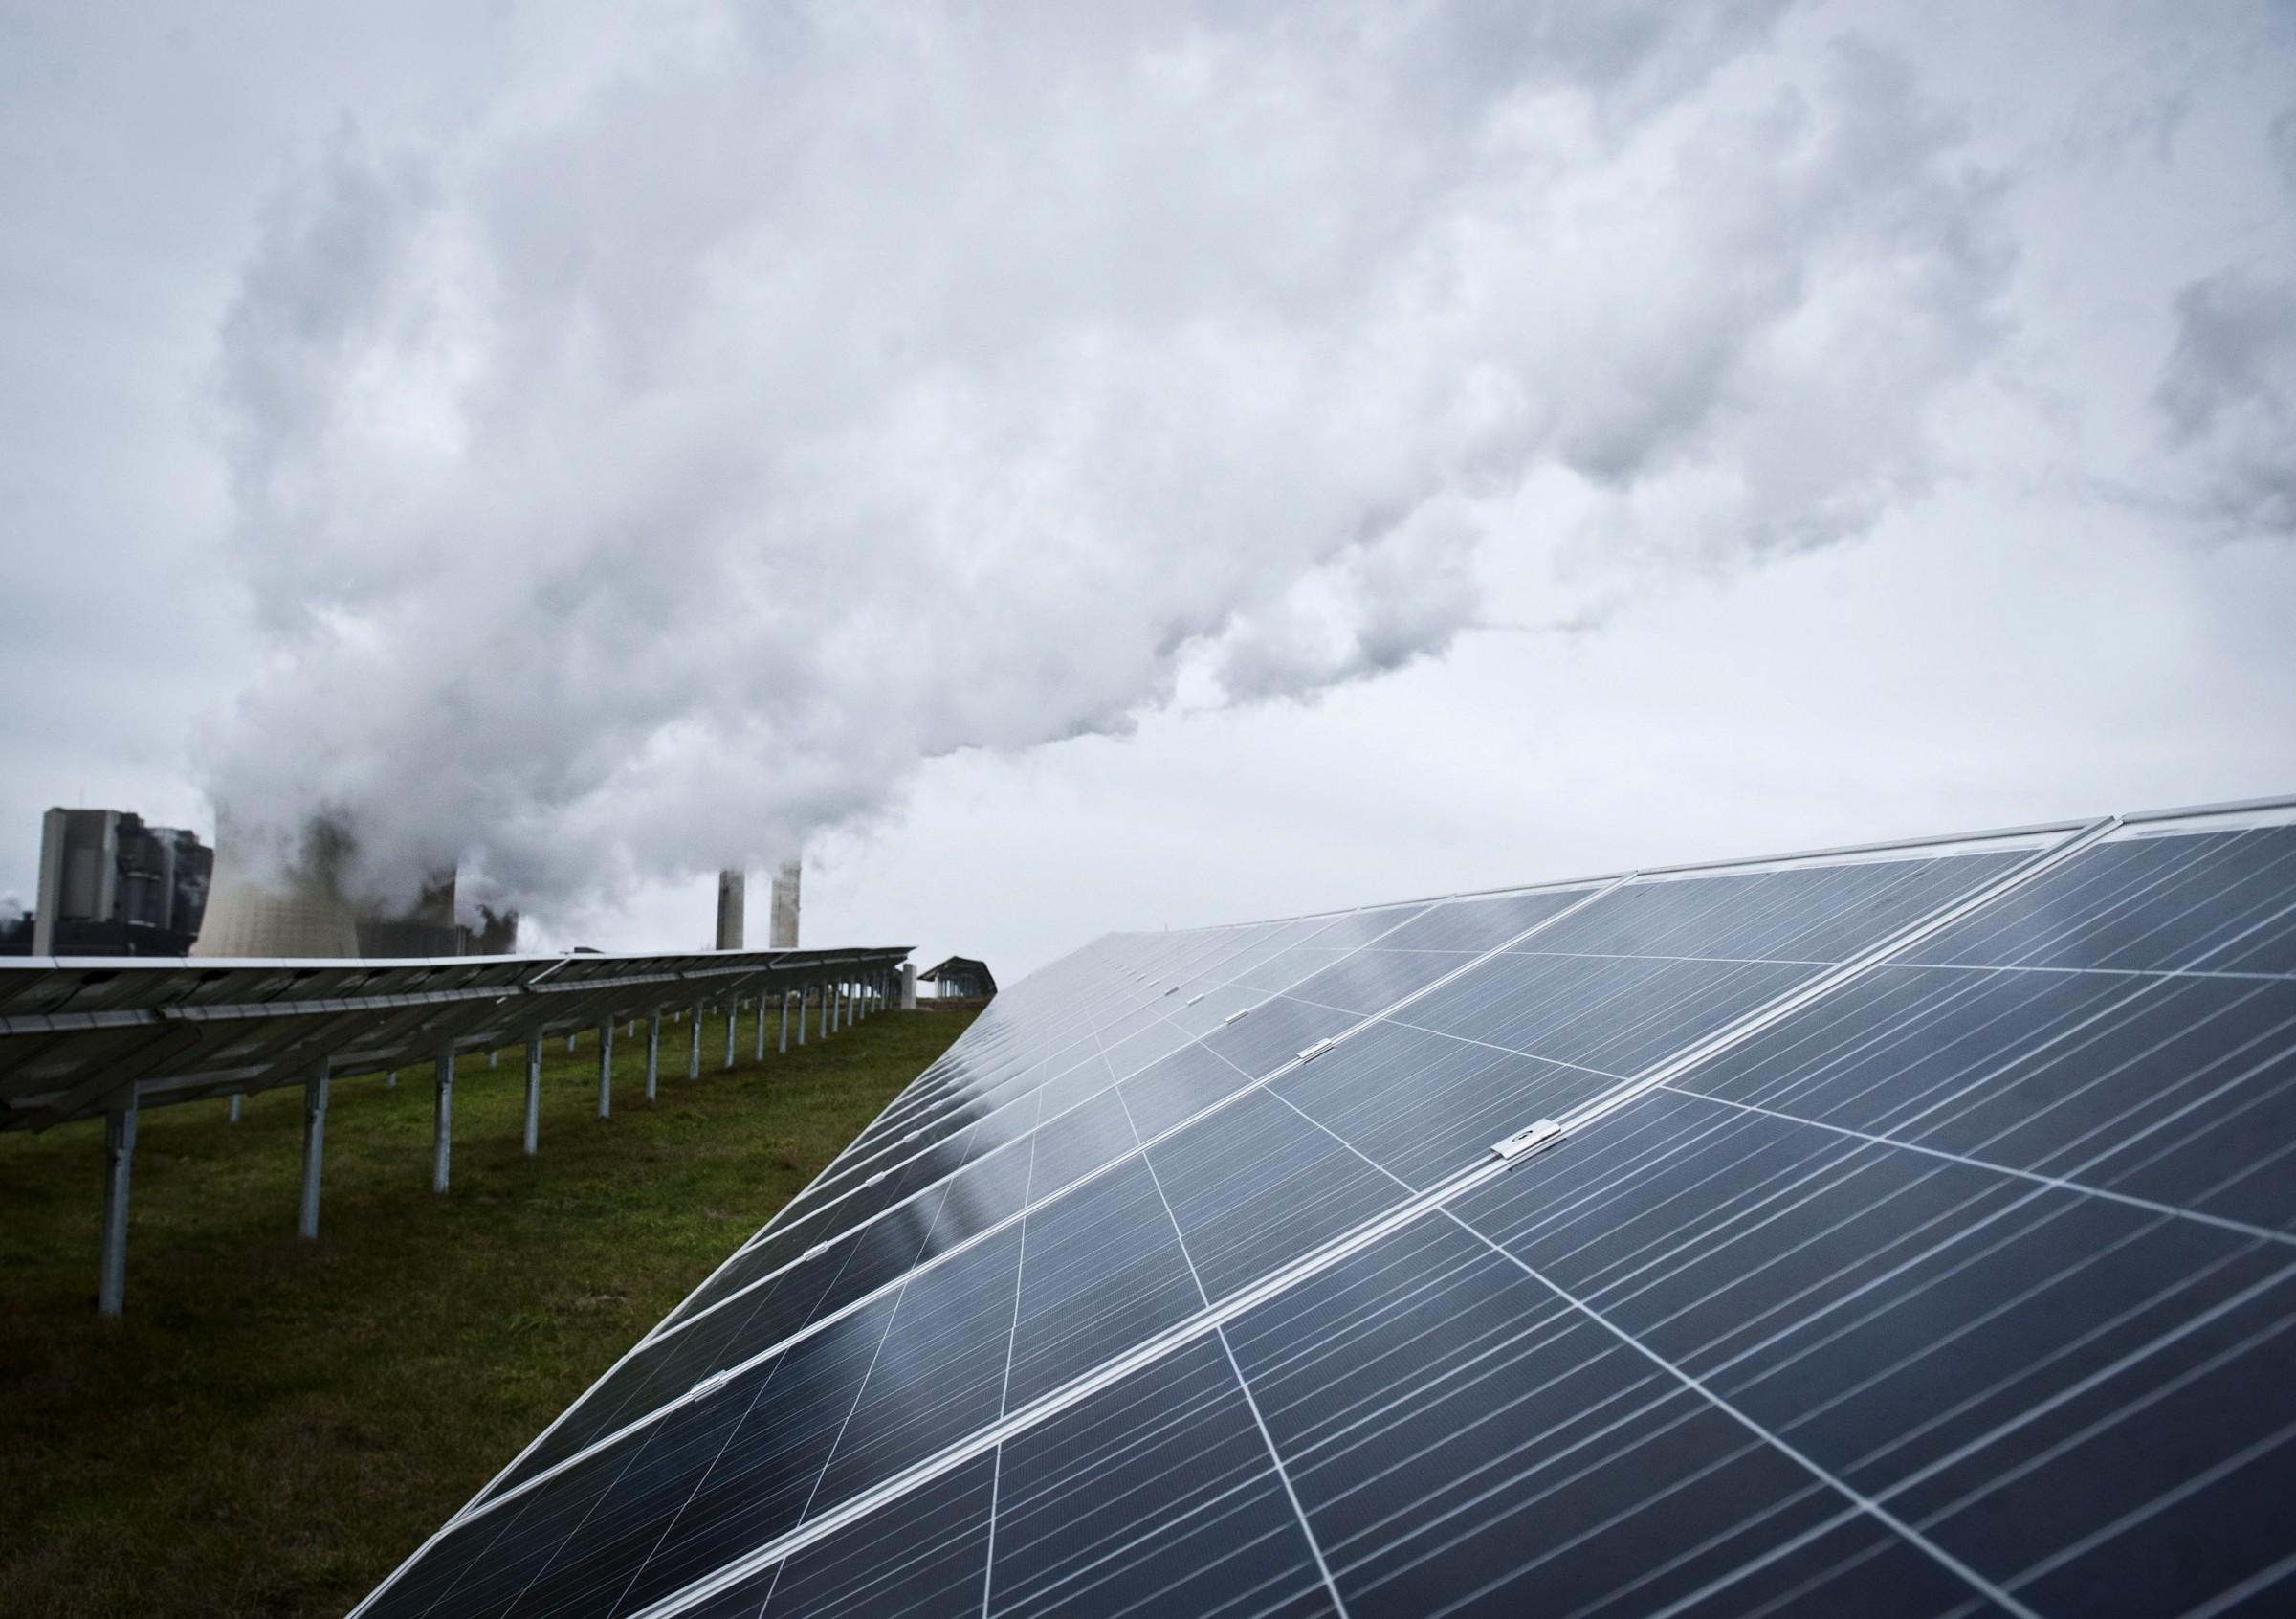 Solar Panels from German company F&S